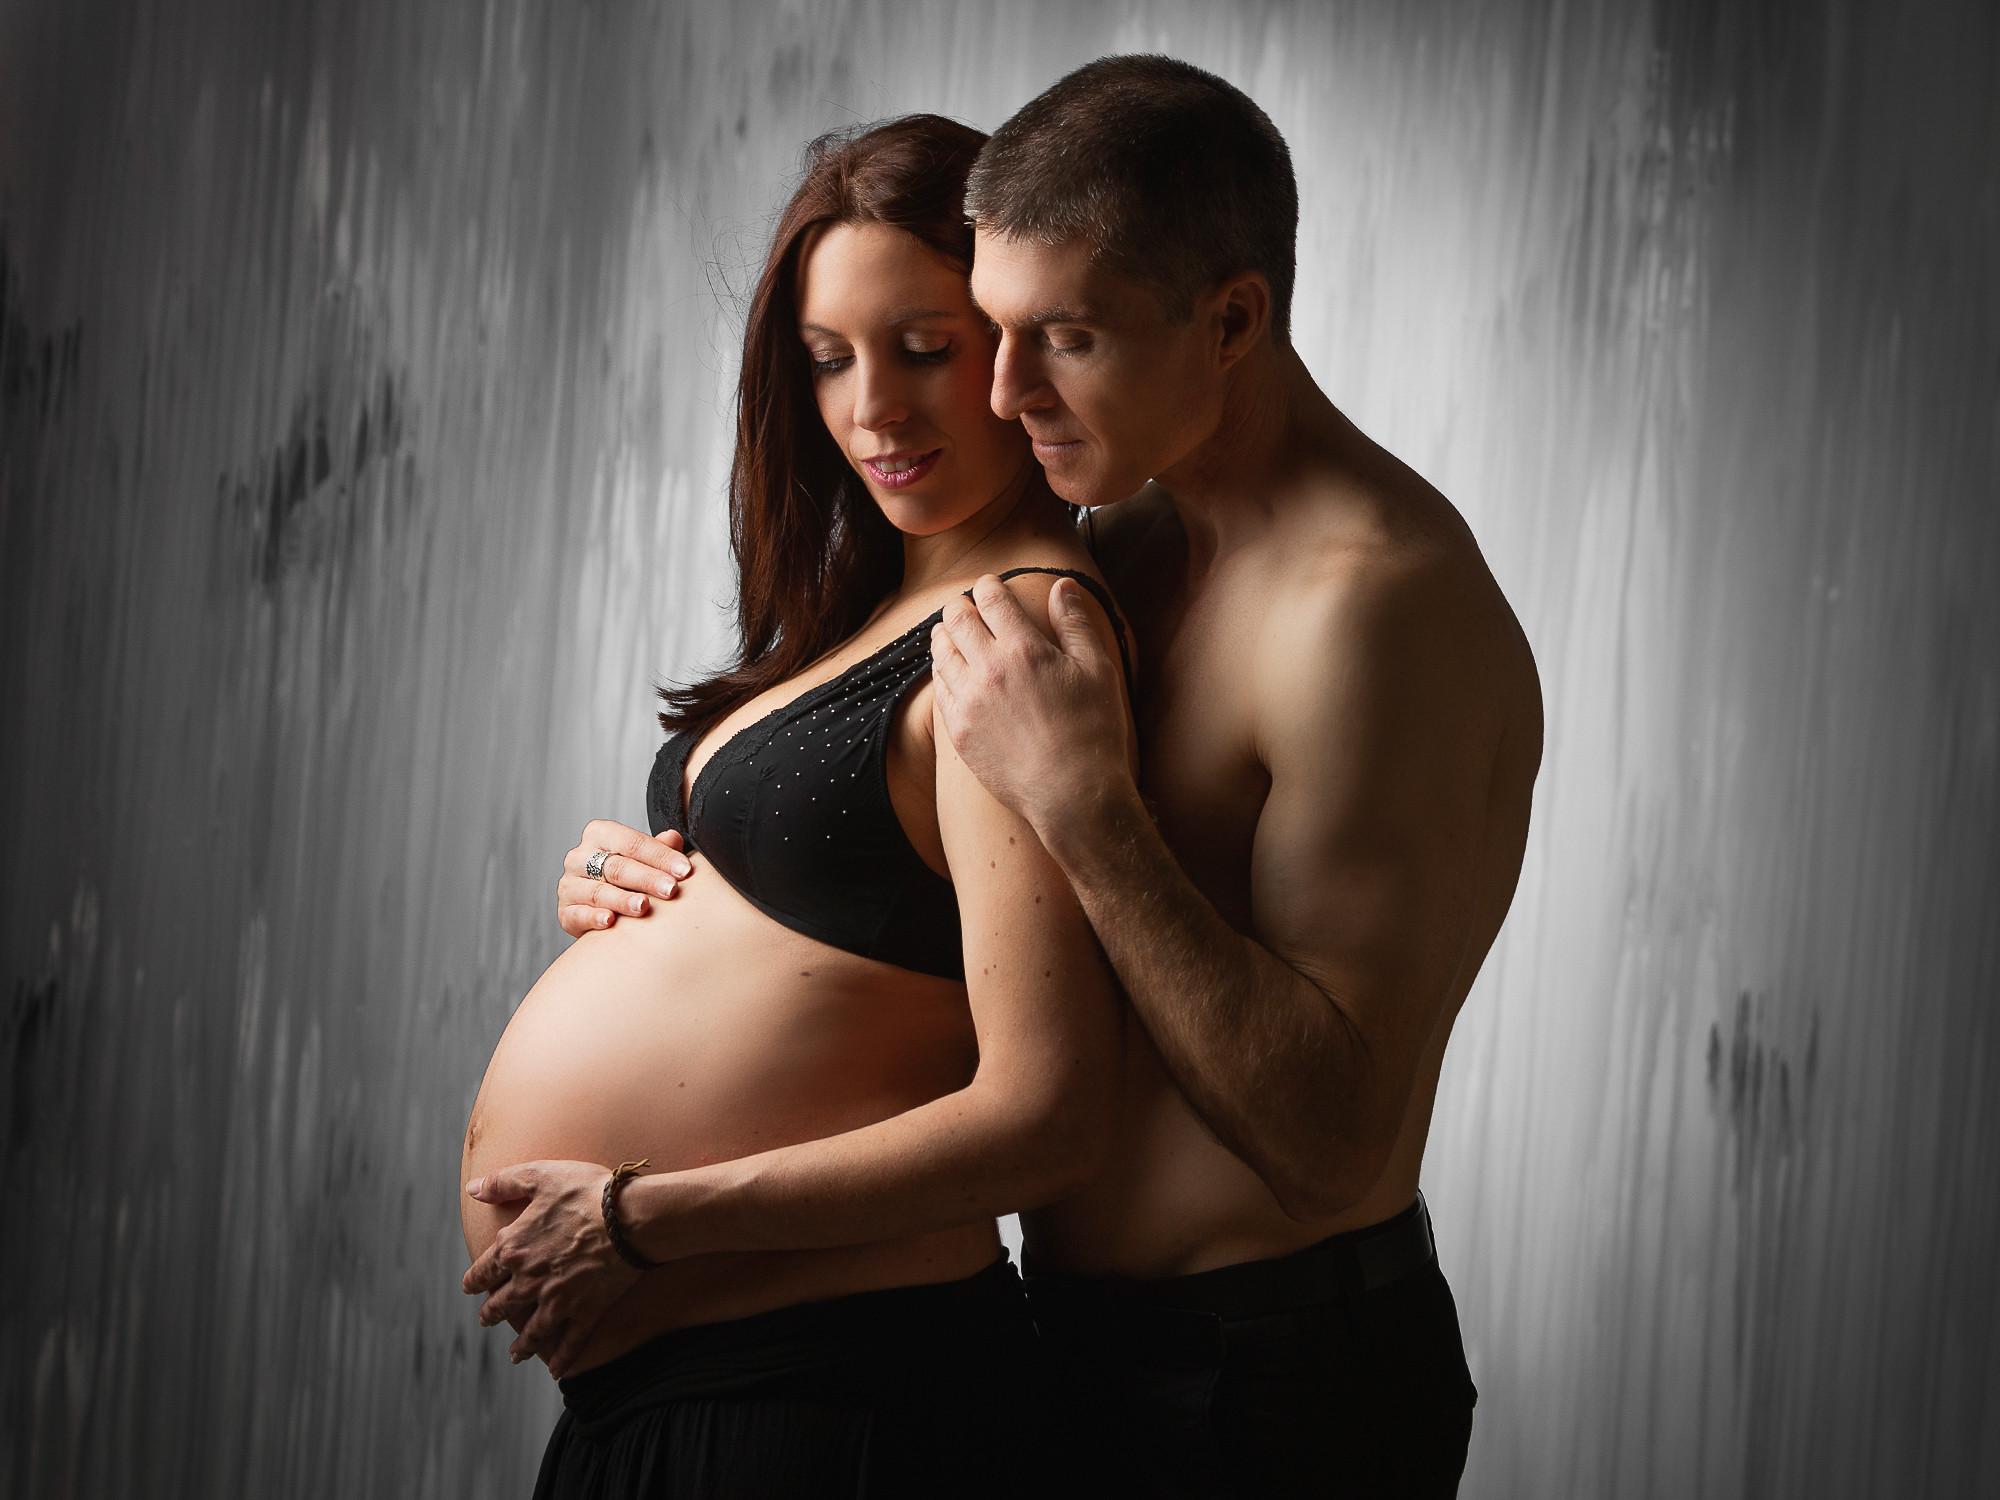 Maternidad_001